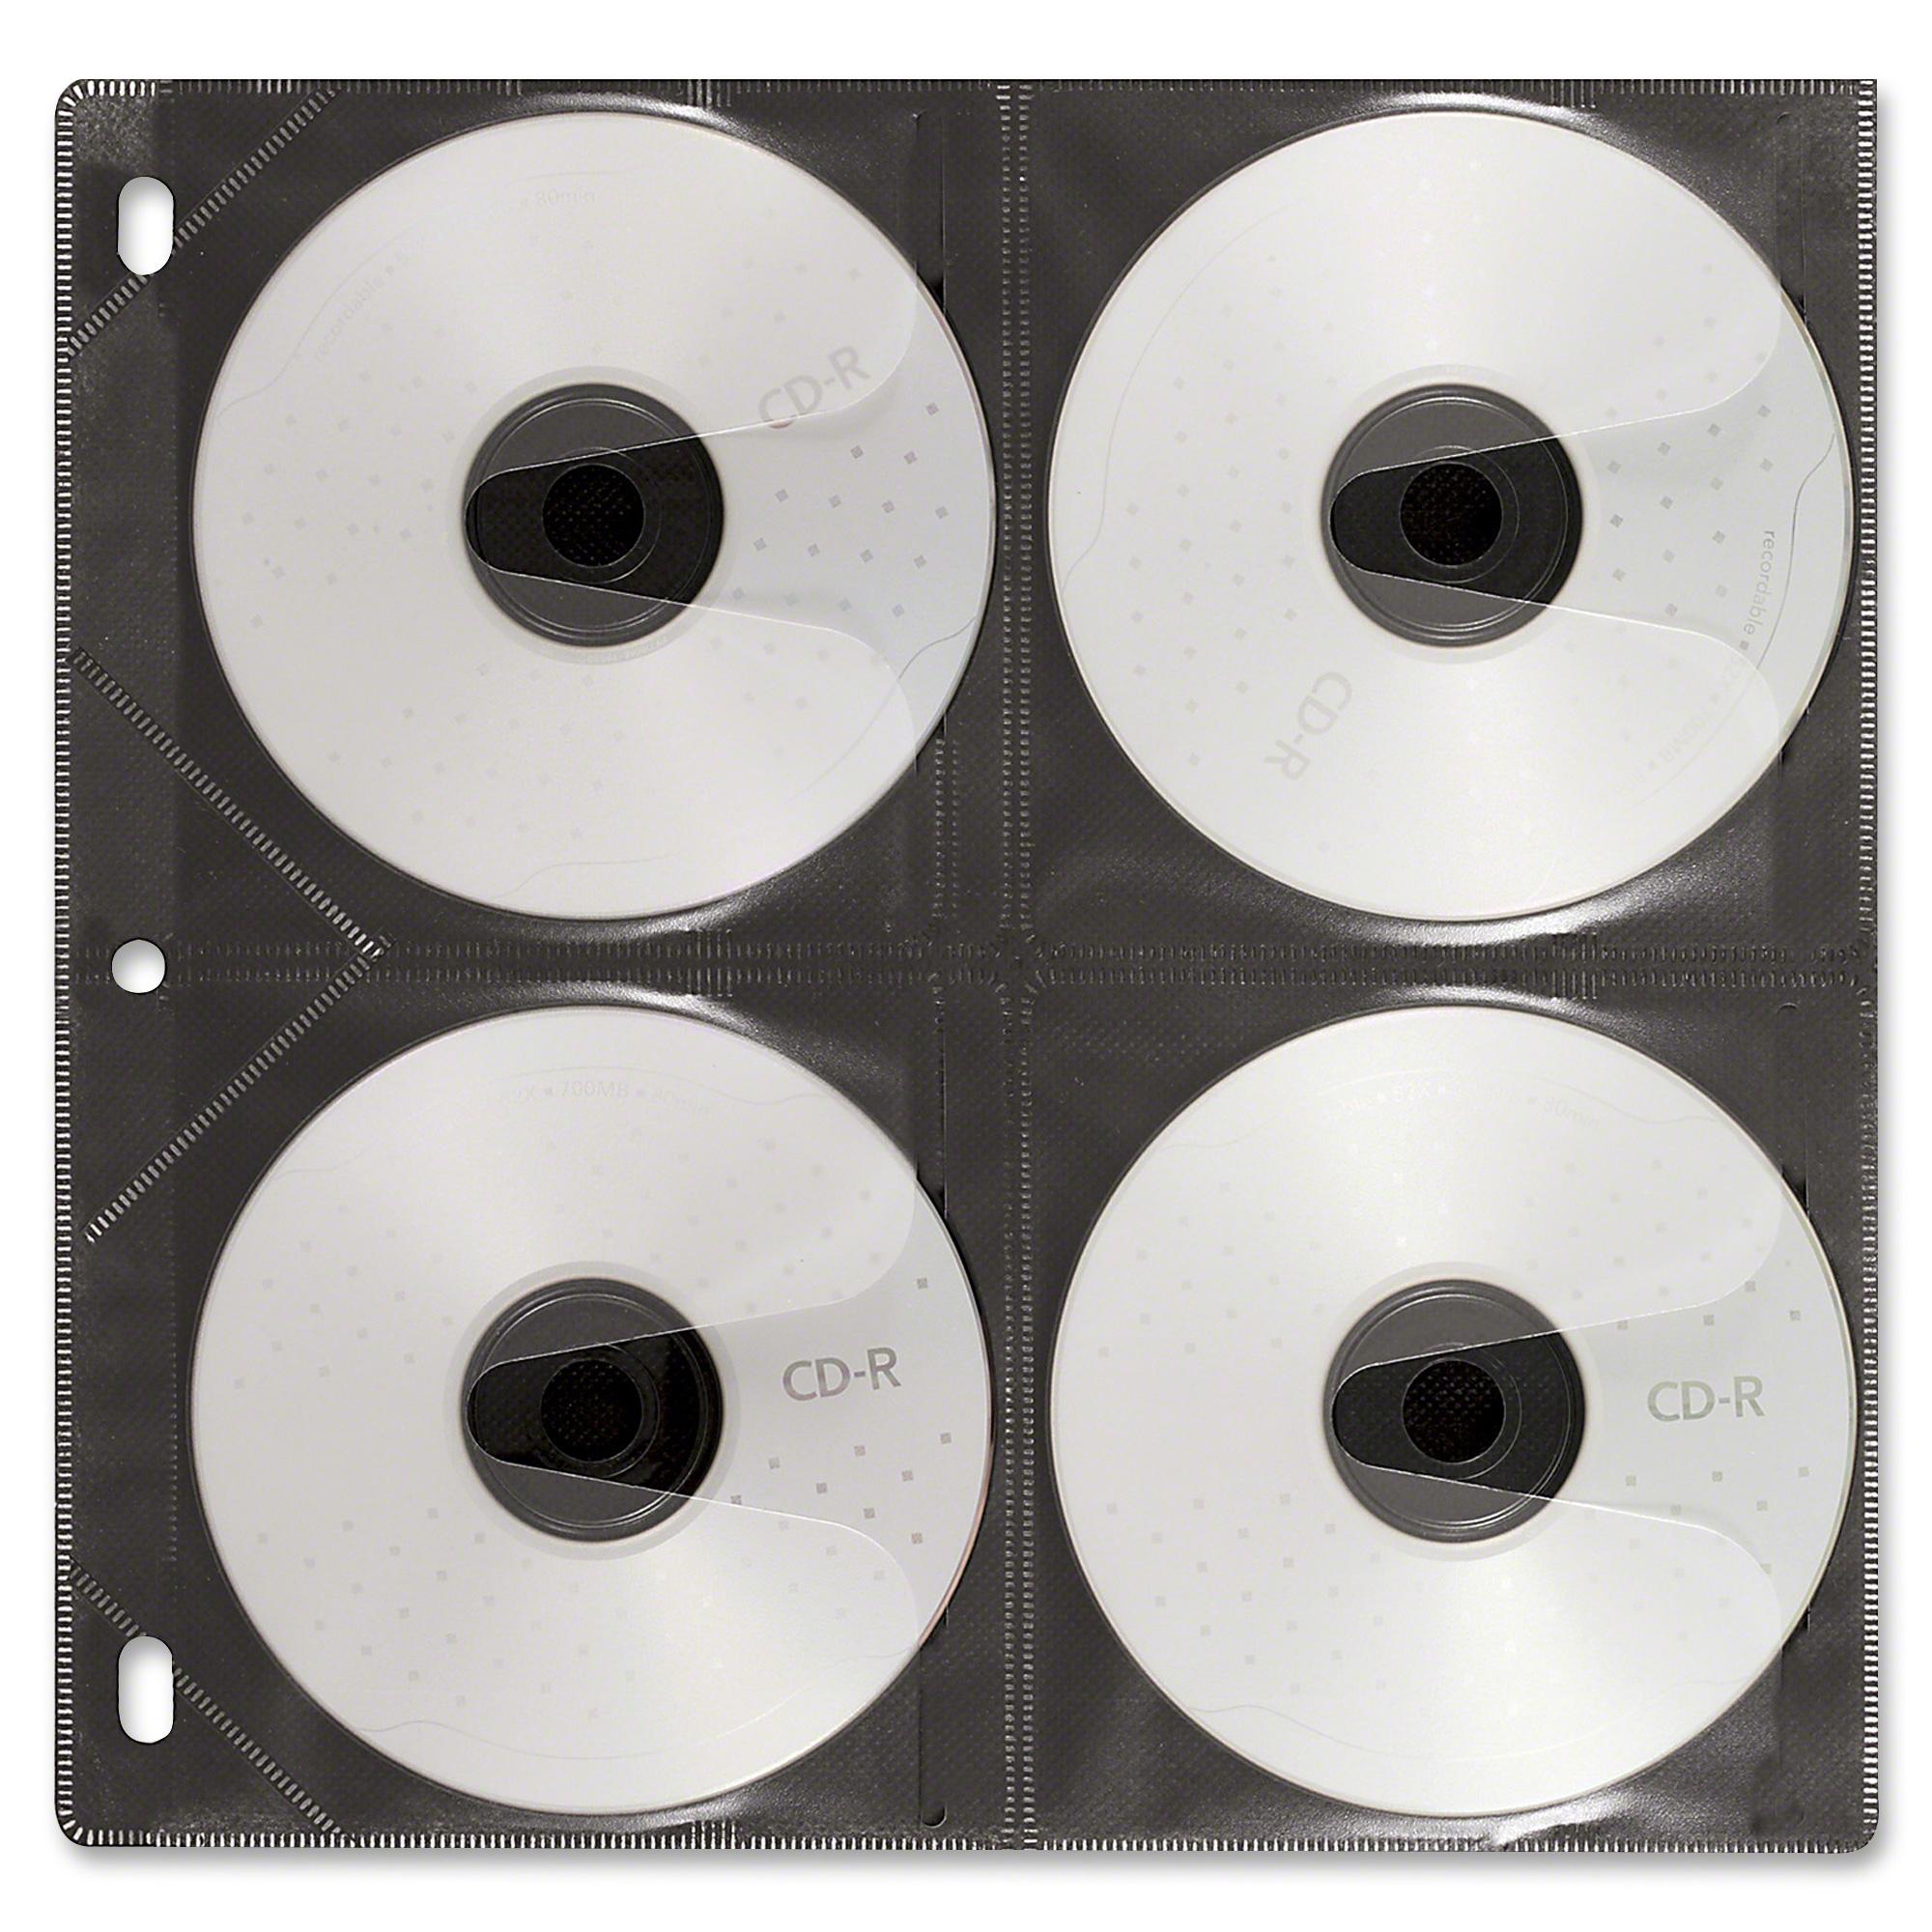 Vaultz Media Binder Sleeves - Album - Slide Insert - Black, Clear - 8 CD/DVD